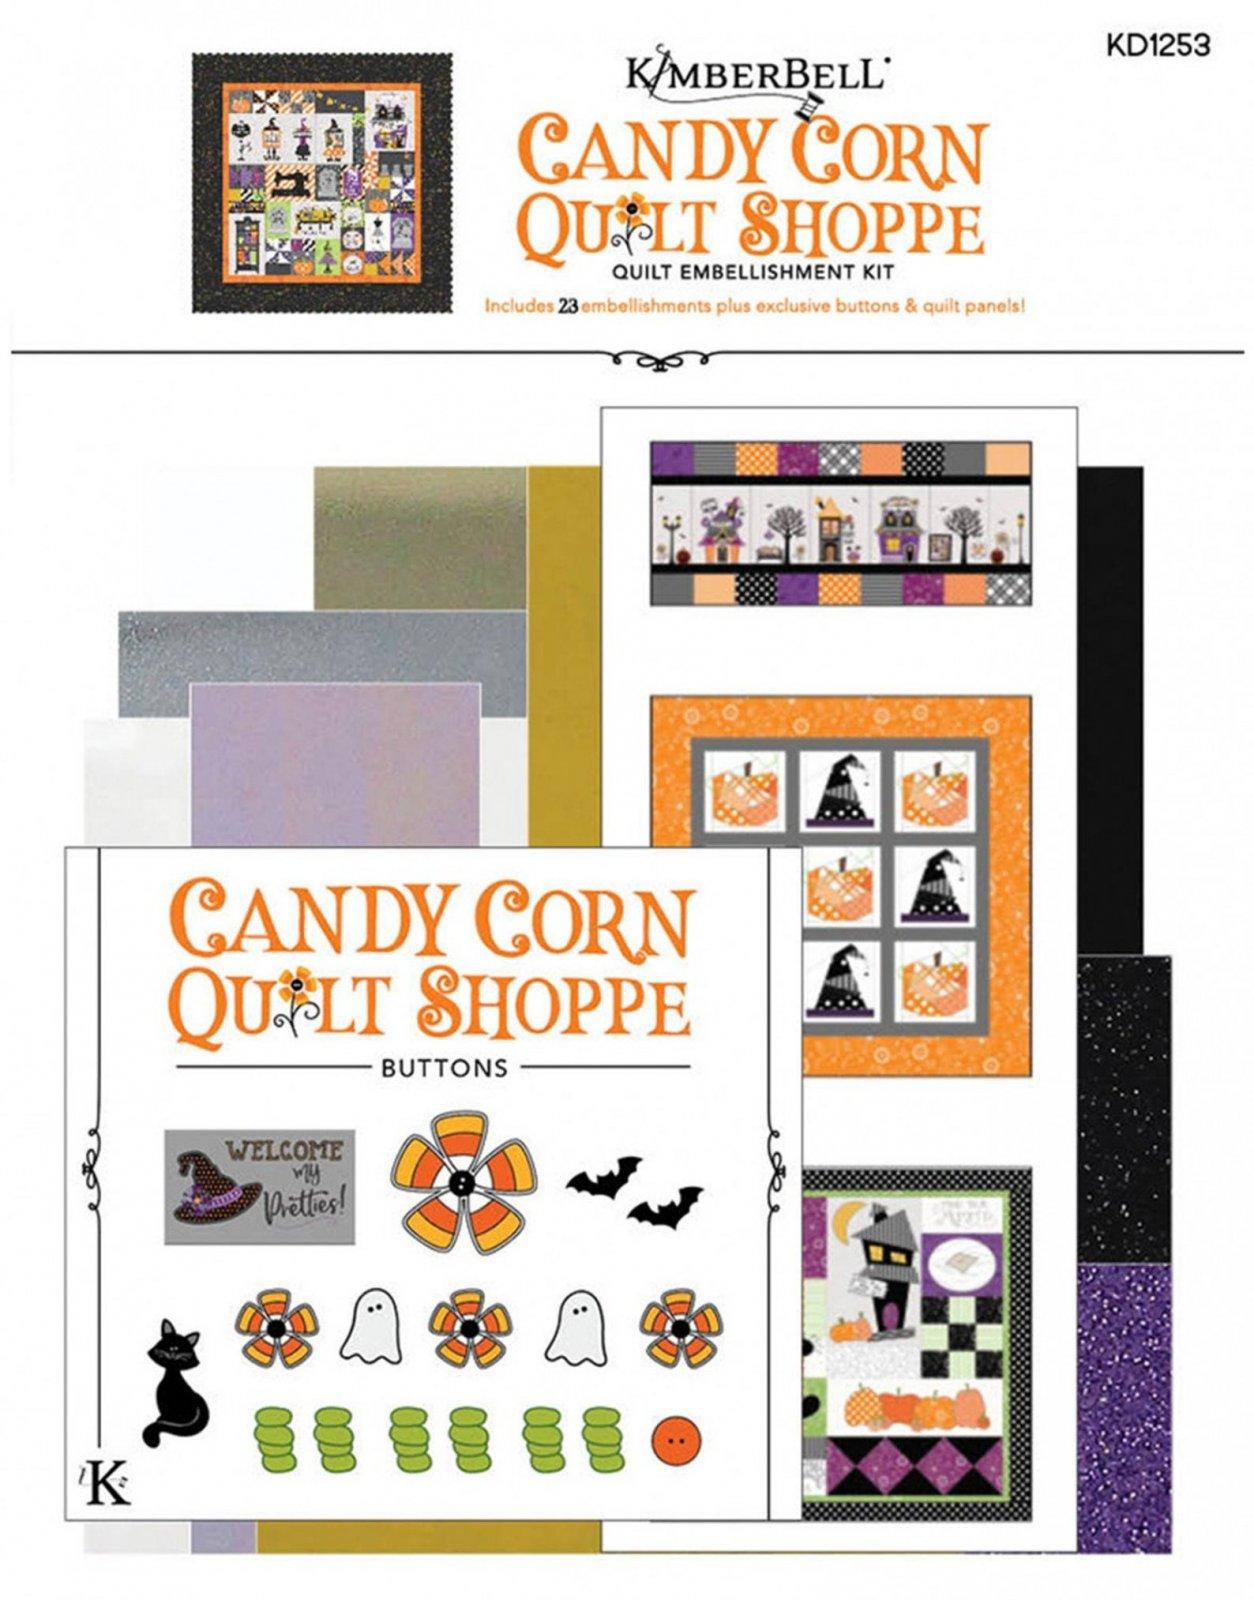 Candy Corn Quilt Shoppe Embellishment Kit